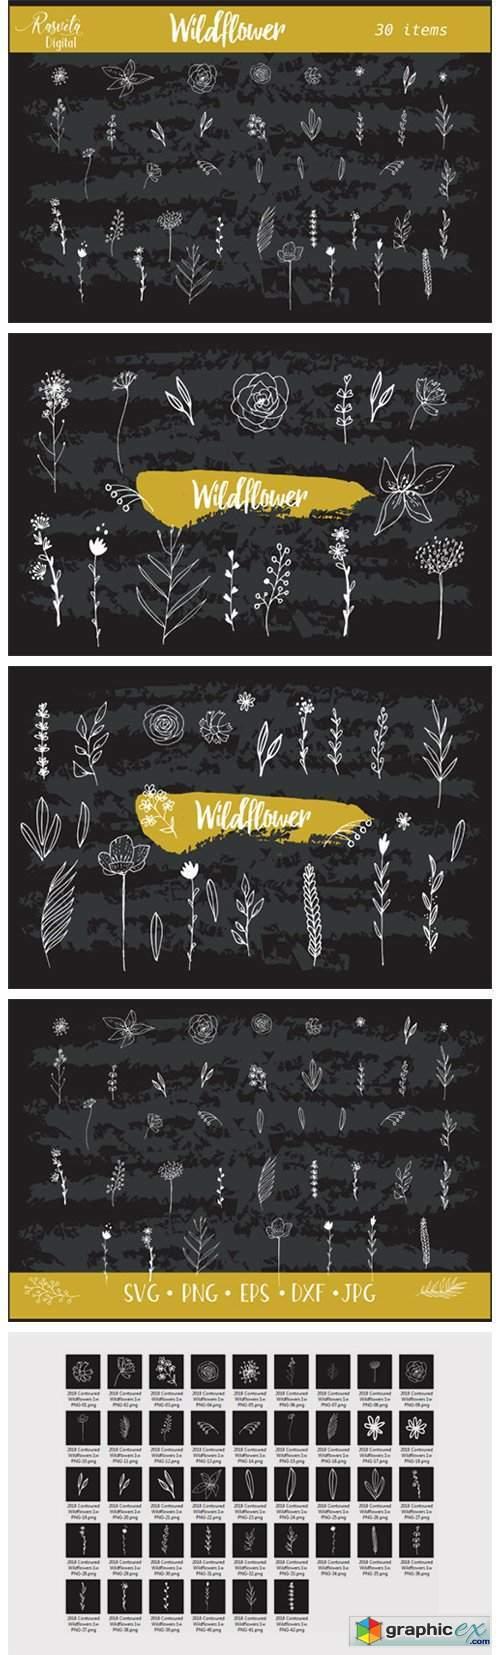 Wedding Wildflower Flowers